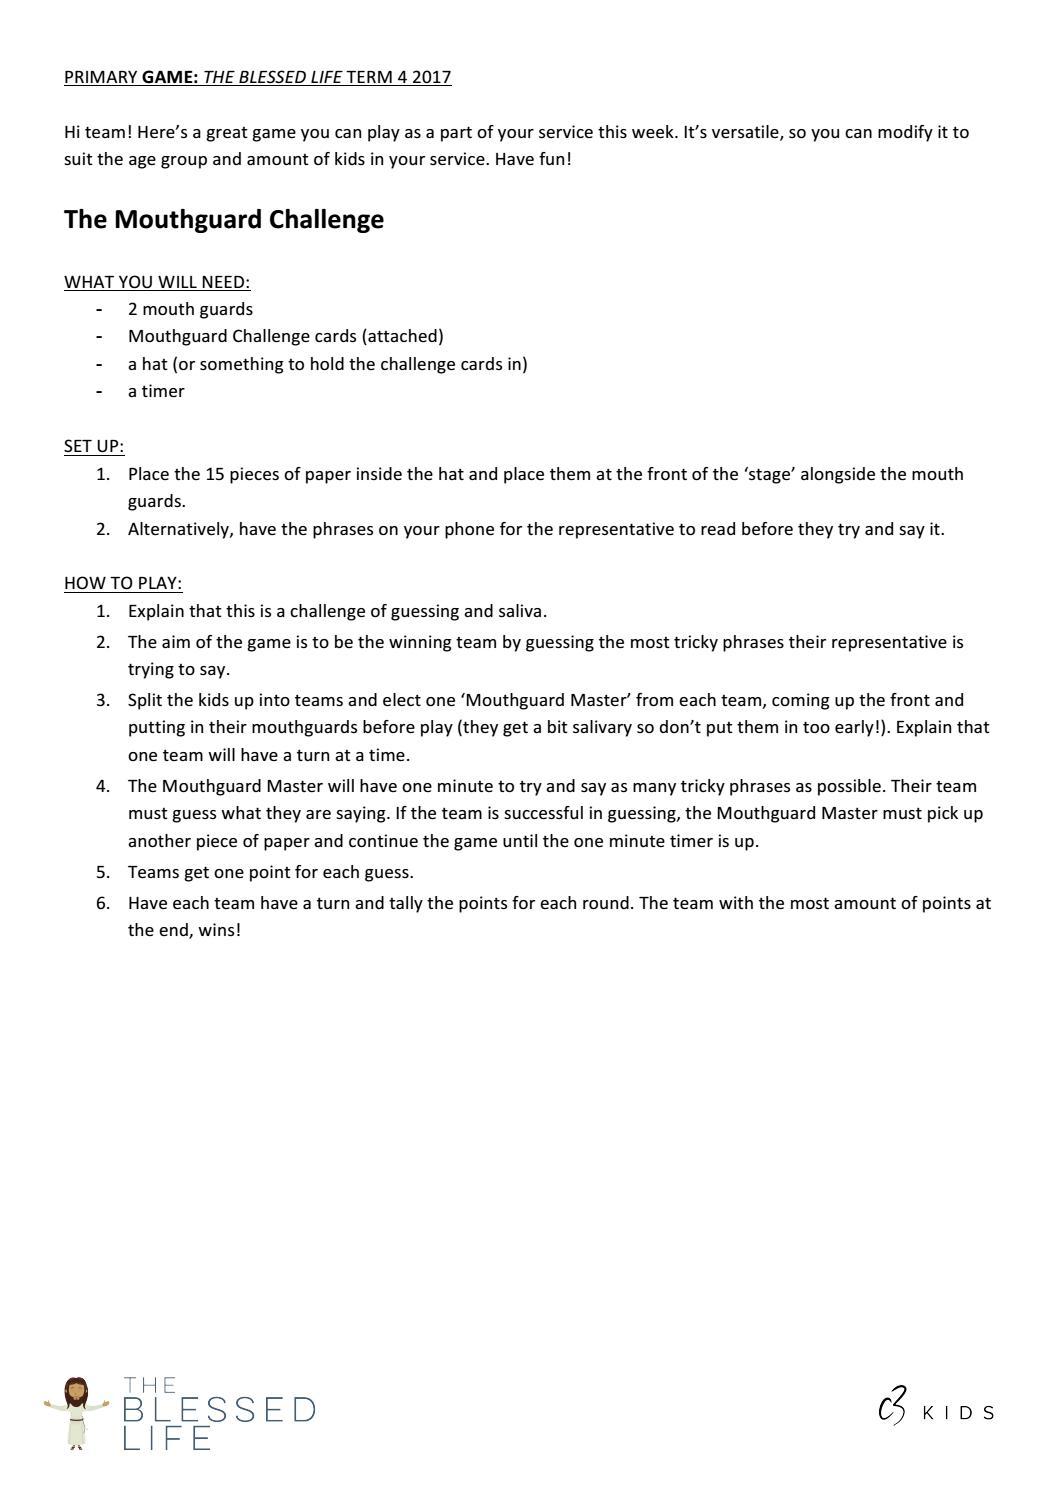 Mouthguard Challenge Phrases : mouthguard, challenge, phrases, Primary, Mouthguard, Challenge, Issuu